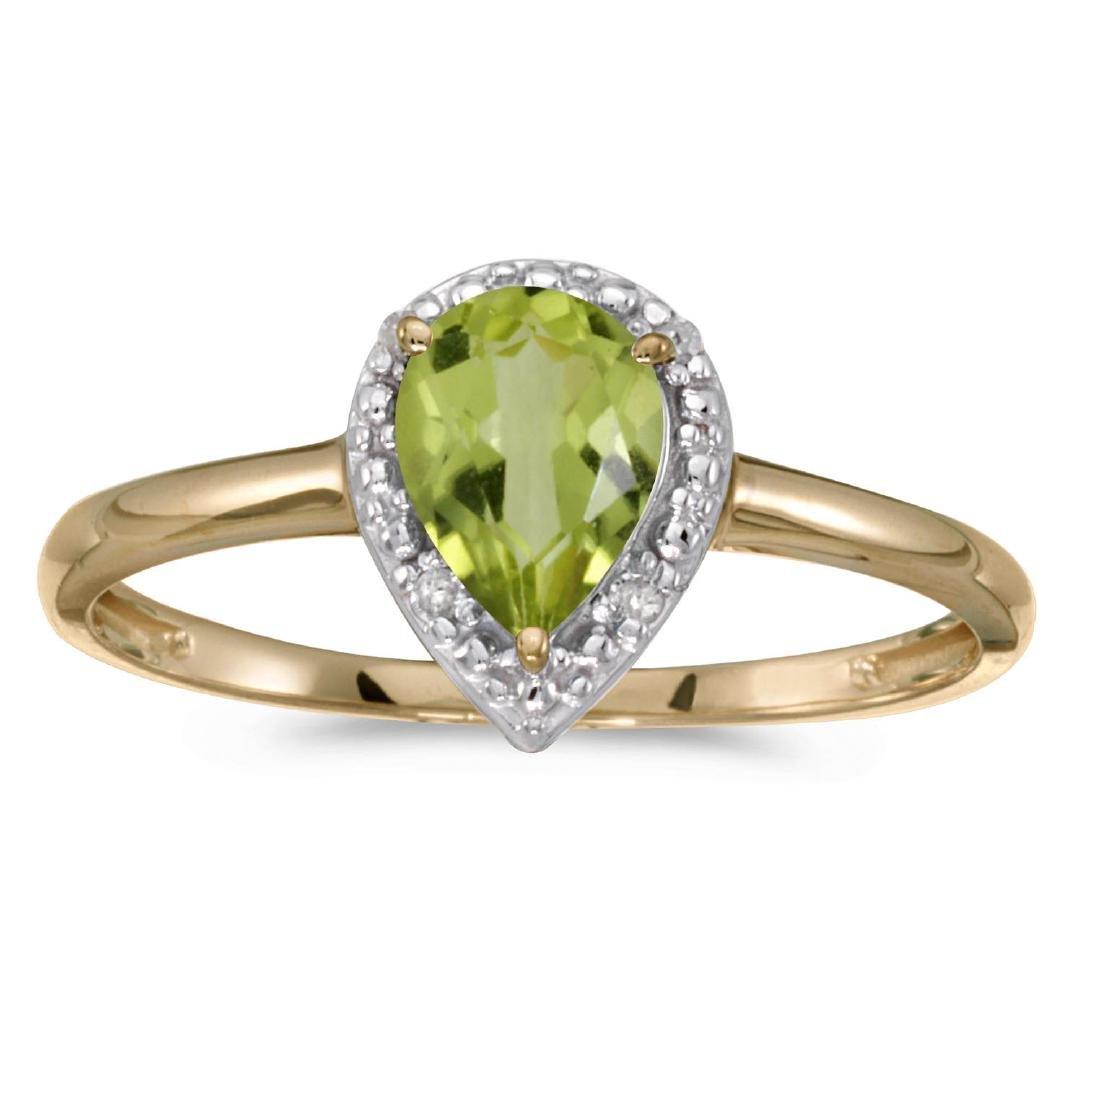 Certified 14k Yellow Gold Pear Peridot And Diamond Ring